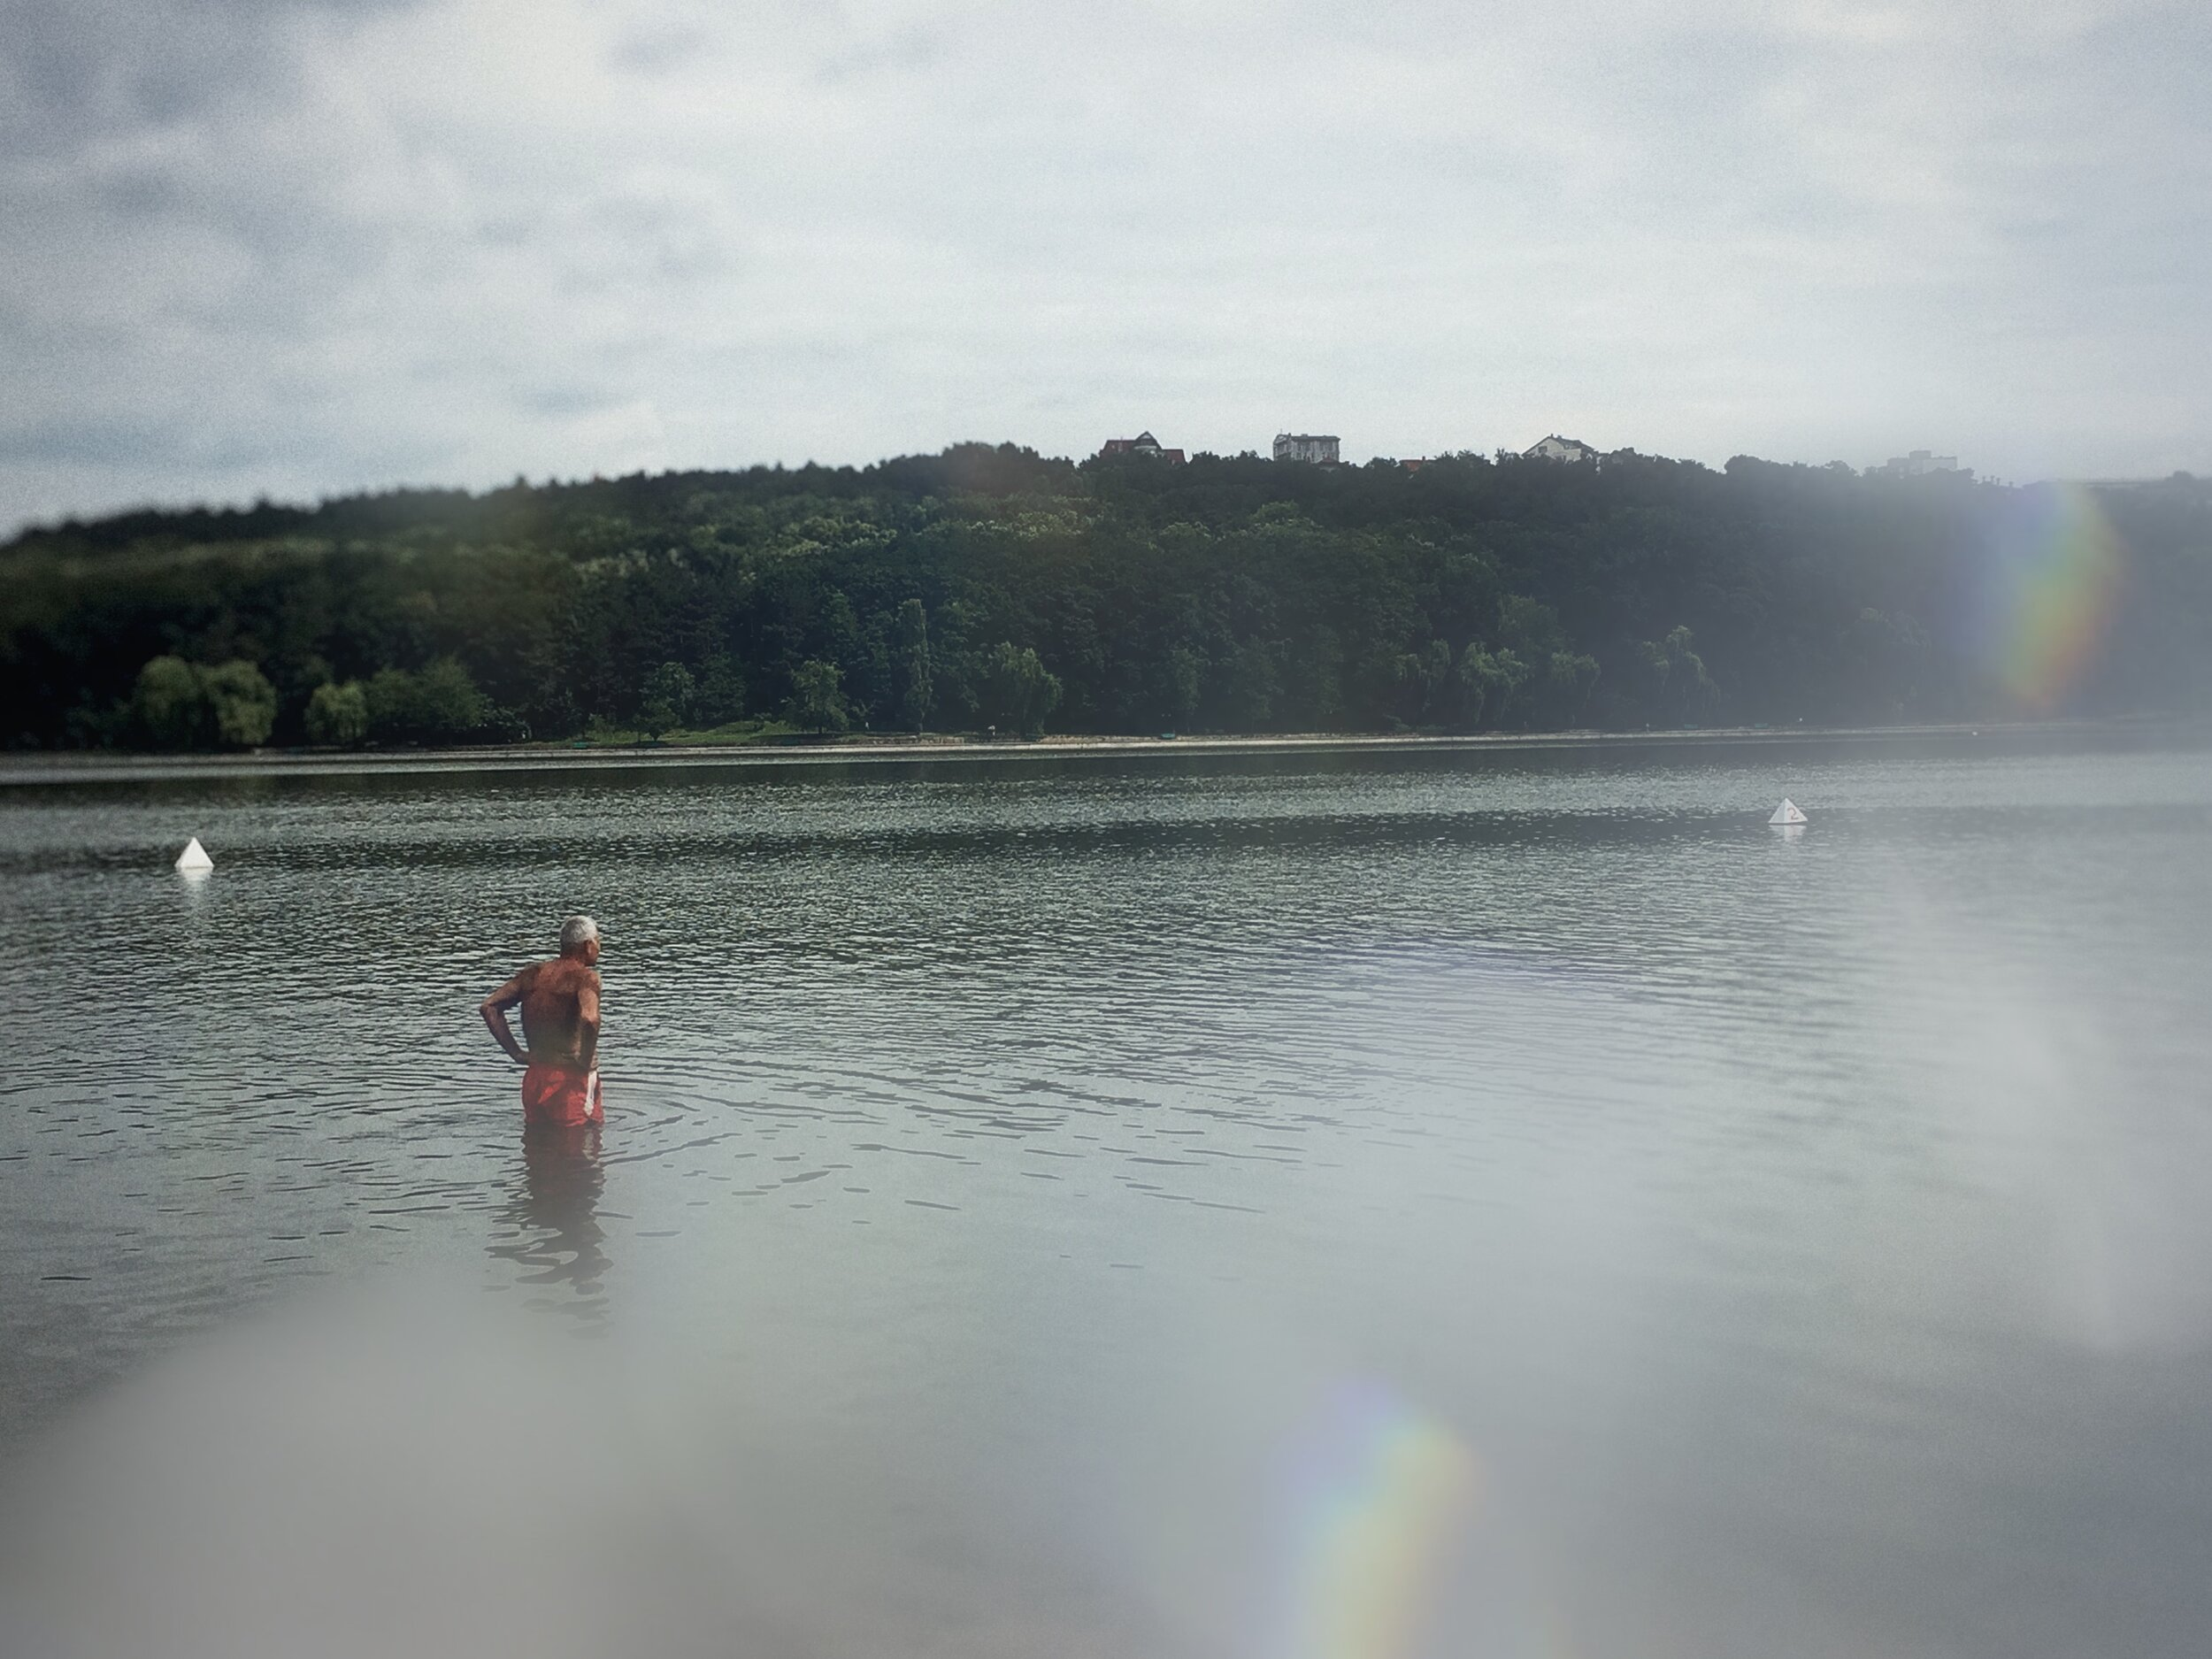 www.Vid-Atlantic.com Prisma Filter Man along in lake